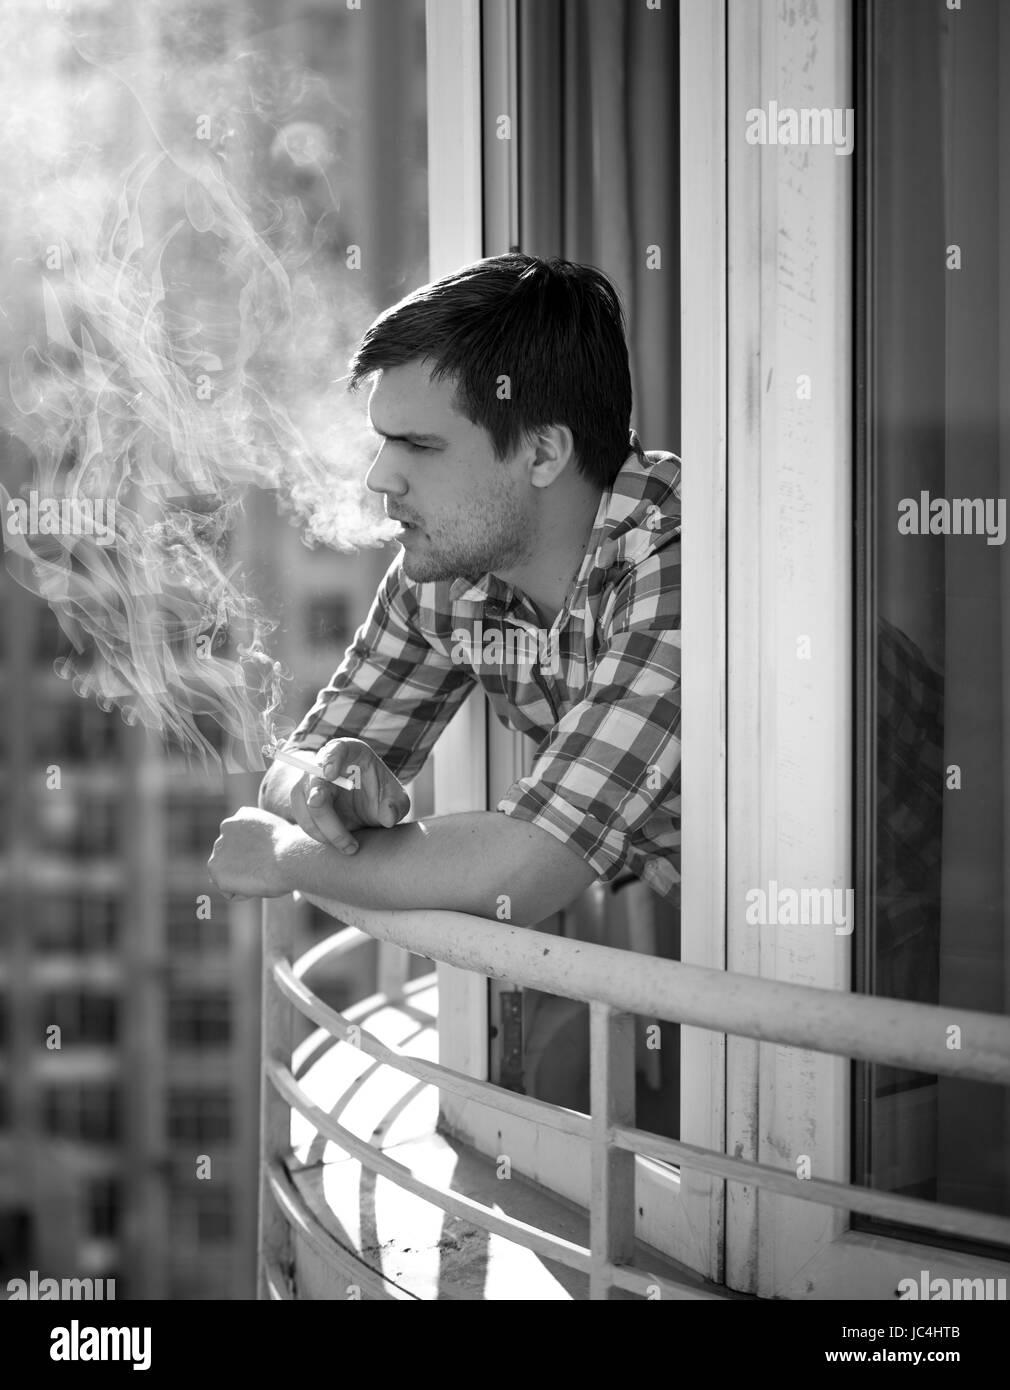 Monochrome portrait of depressed man smoking cigarette stock